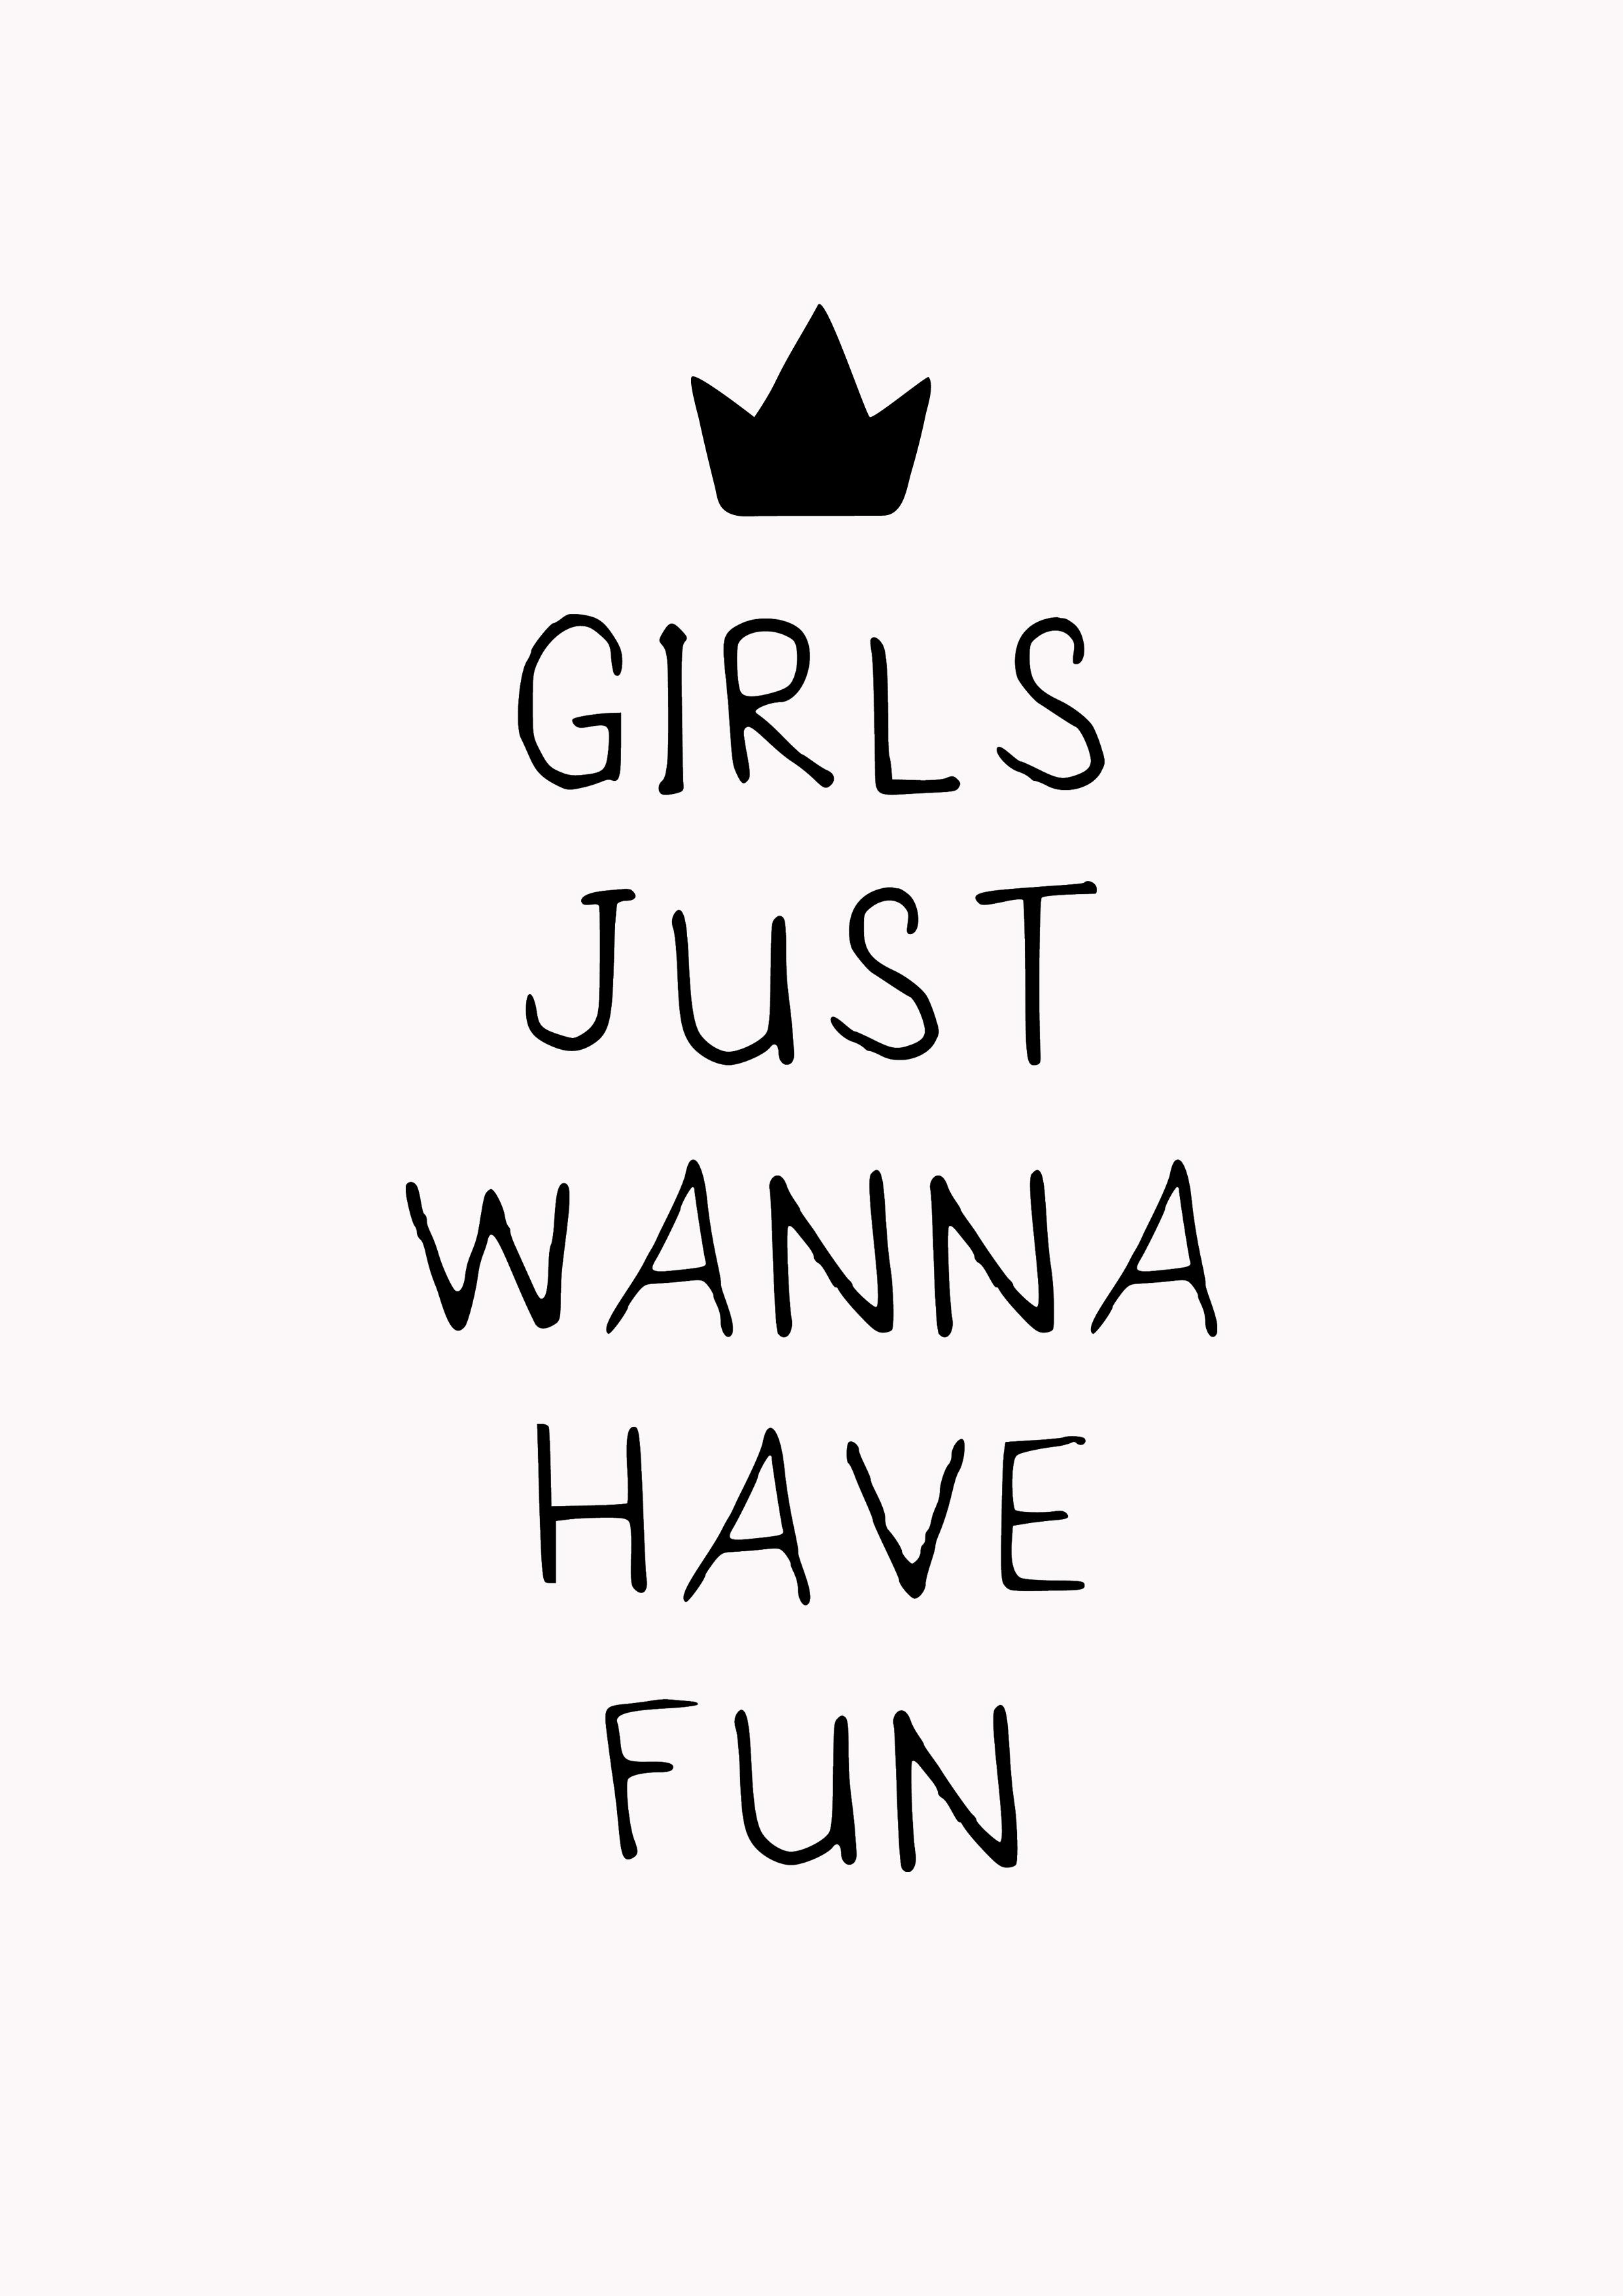 118dffd7b5 Pôster Girls Just Wanna Have Fun no Elo7